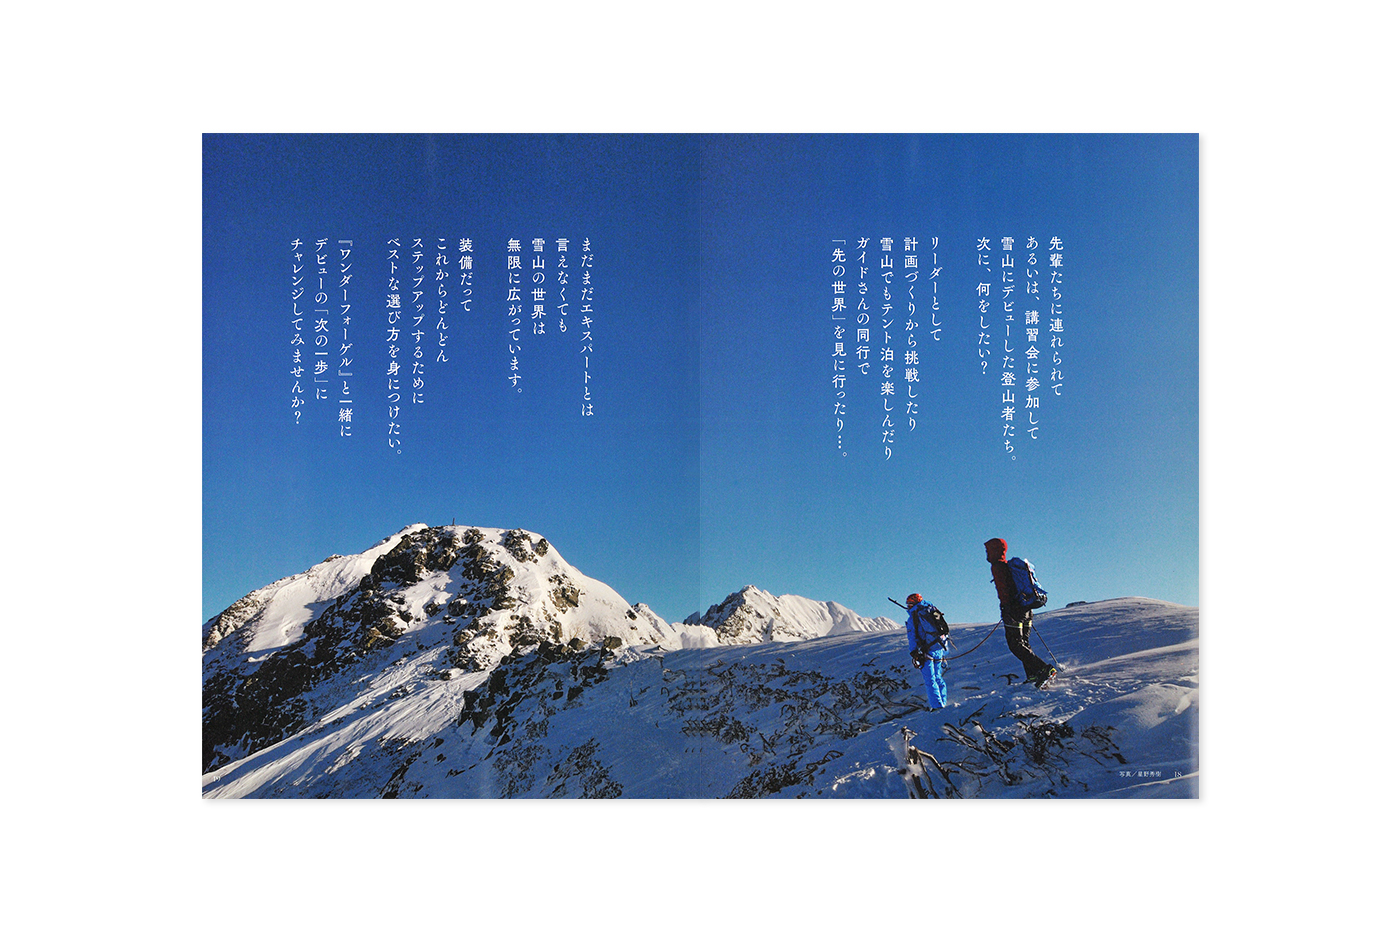 wv12_2016_12_6